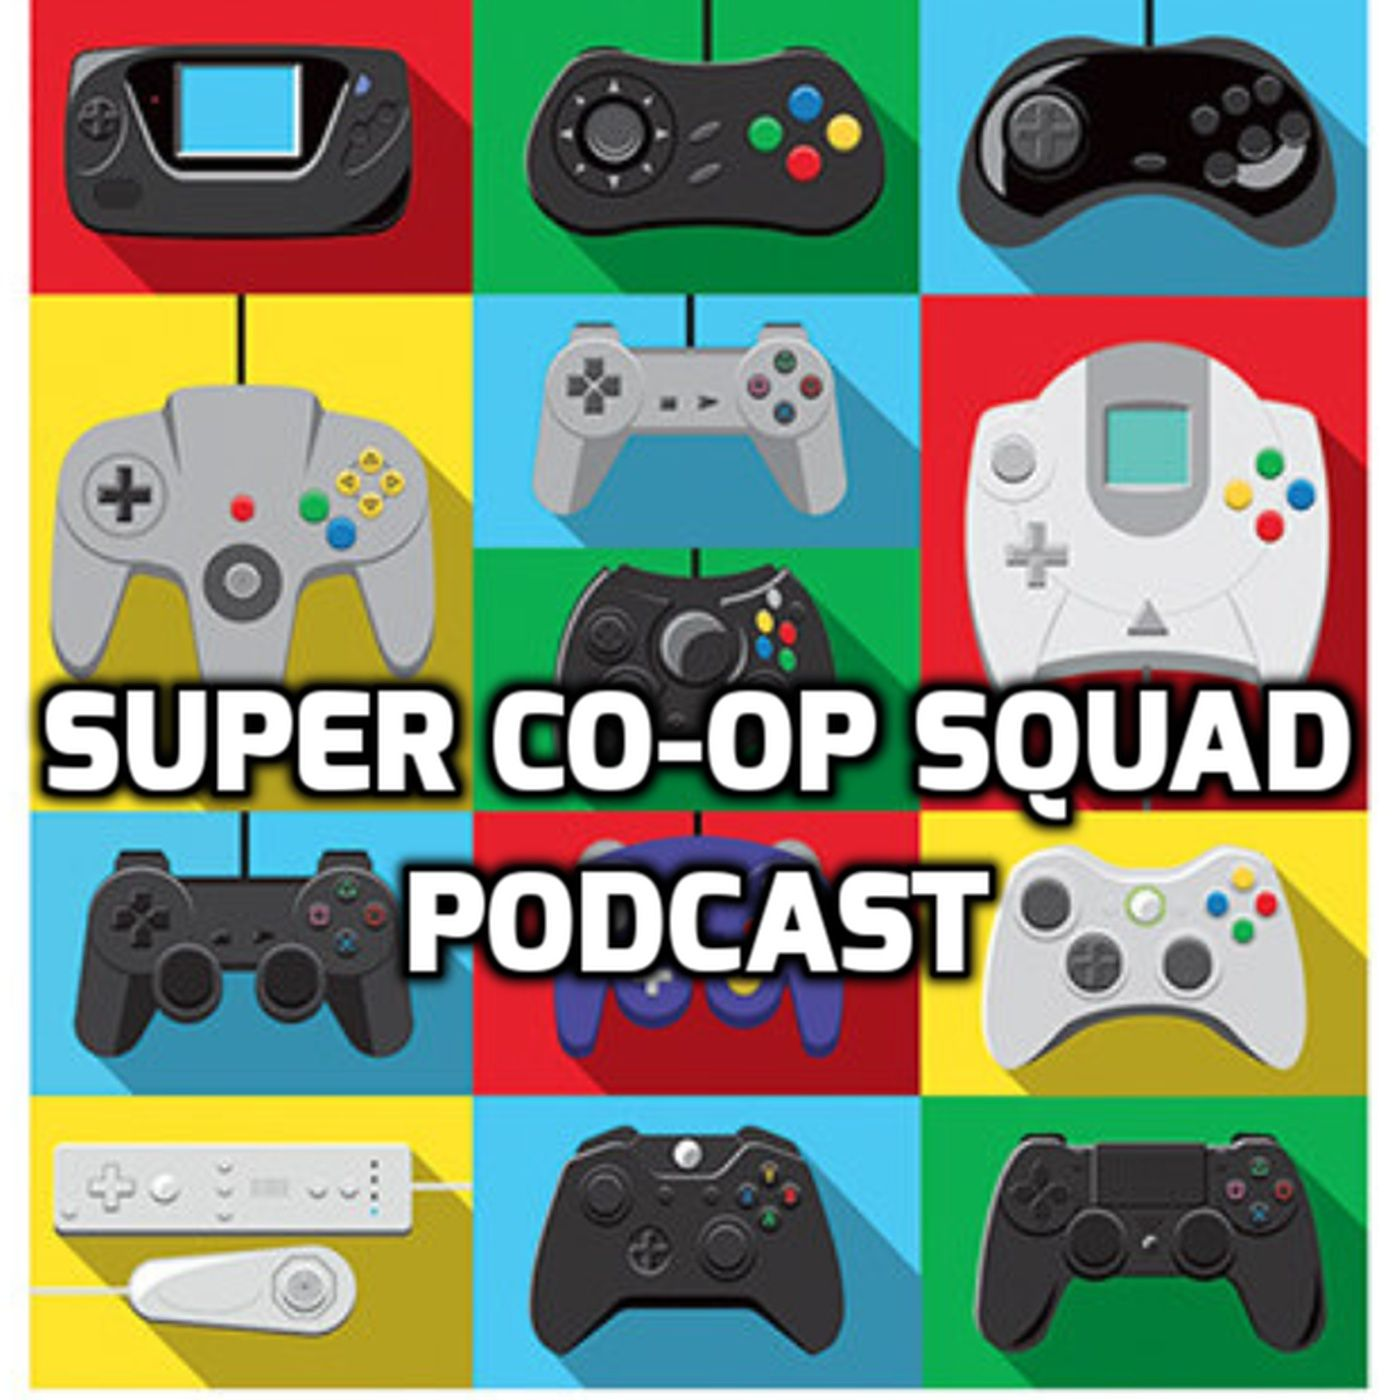 Super Co-op Squad